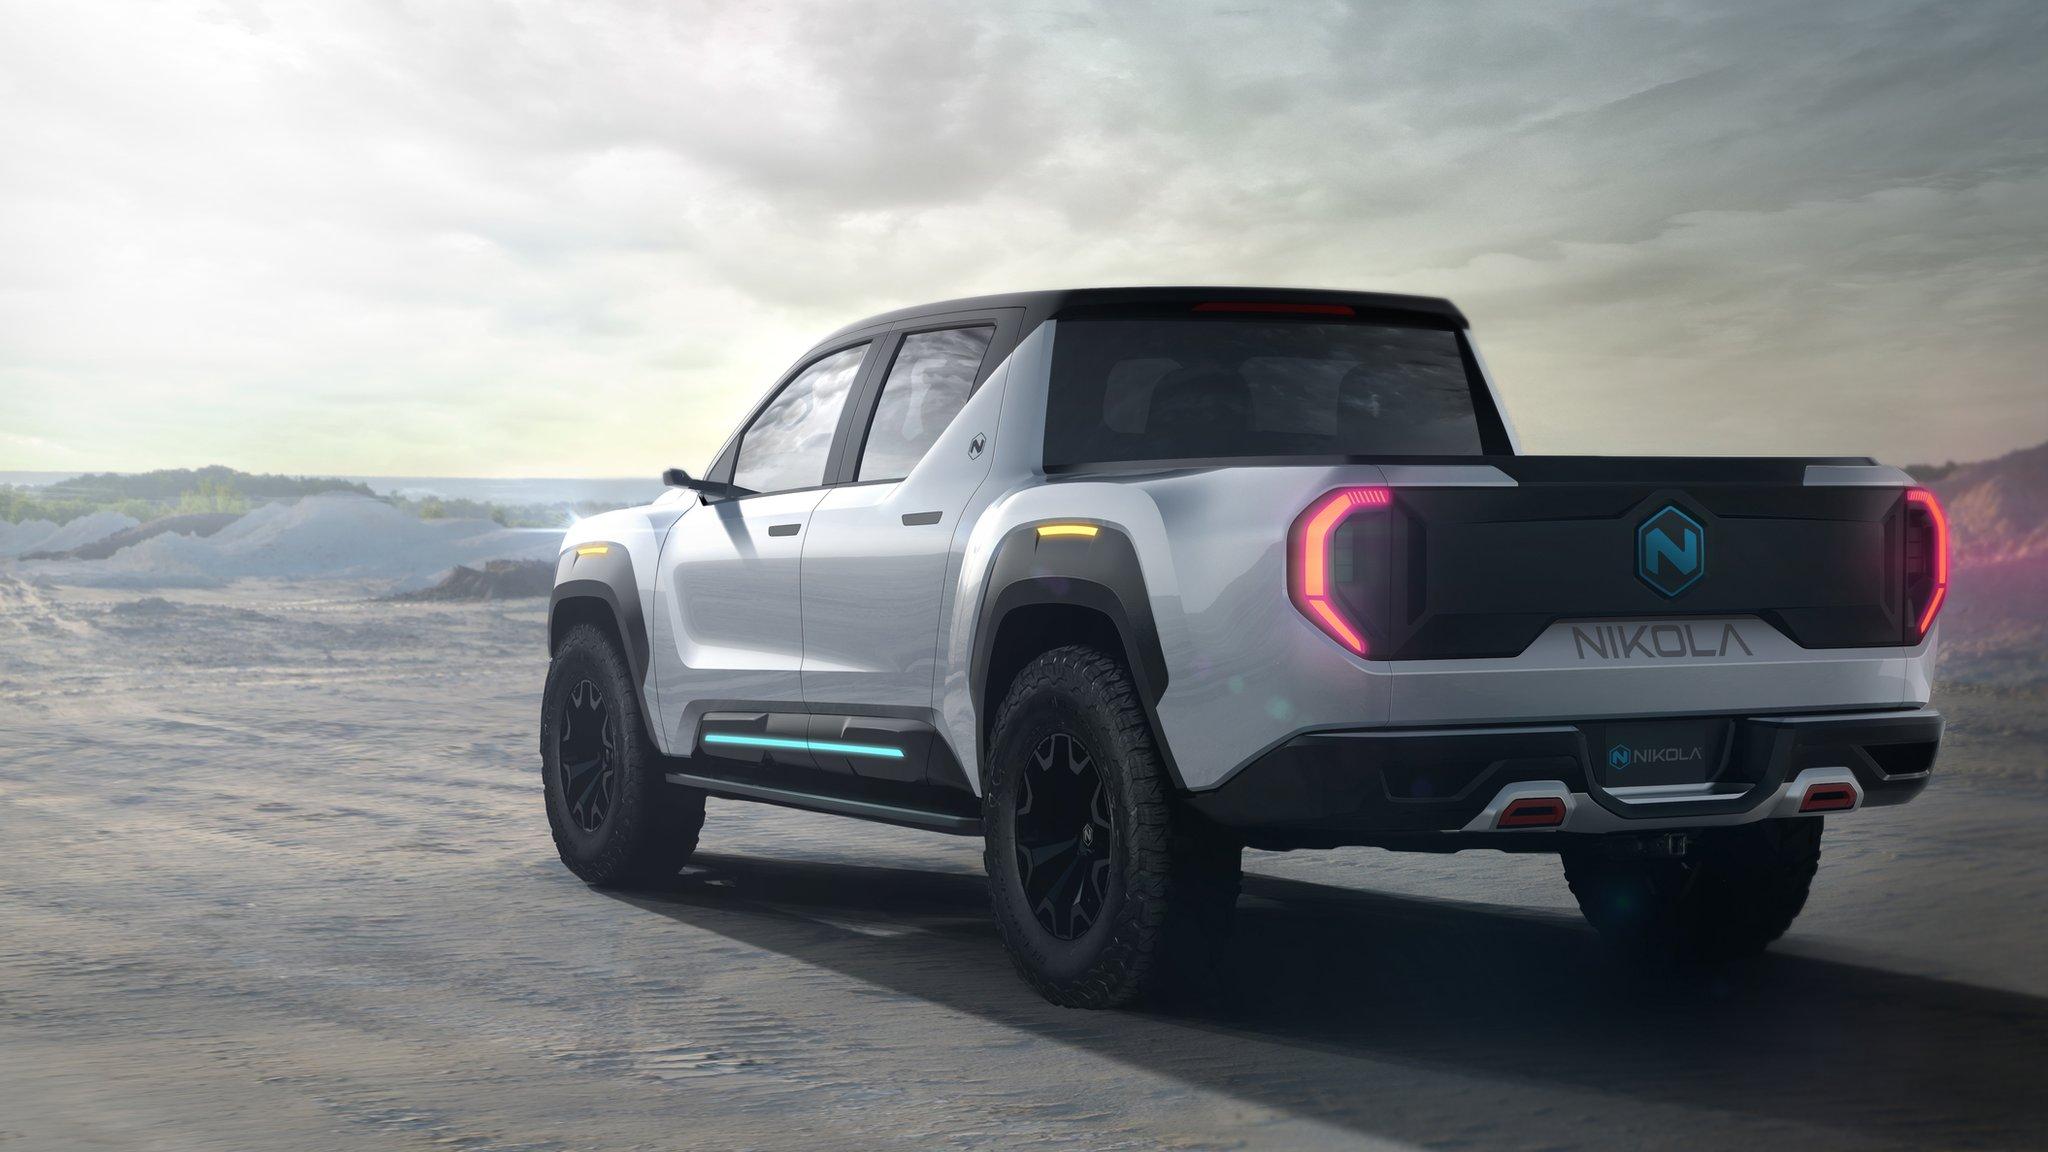 Electric Truck Start Up Nikola Takes On Car Giants Bbc News